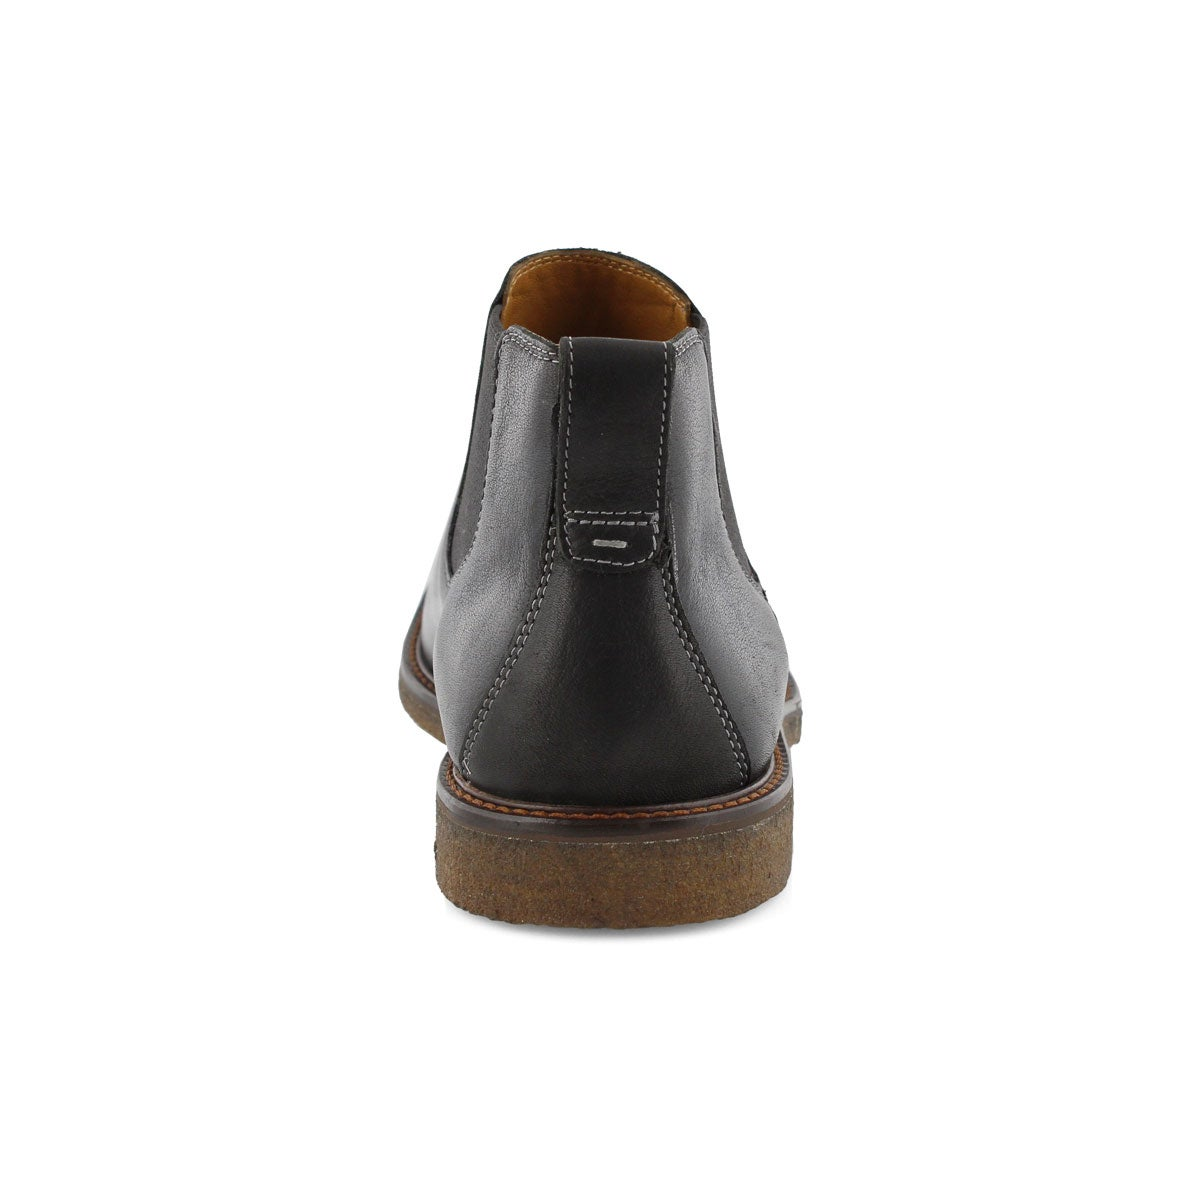 Mns Copeland Chelsea black dress boot